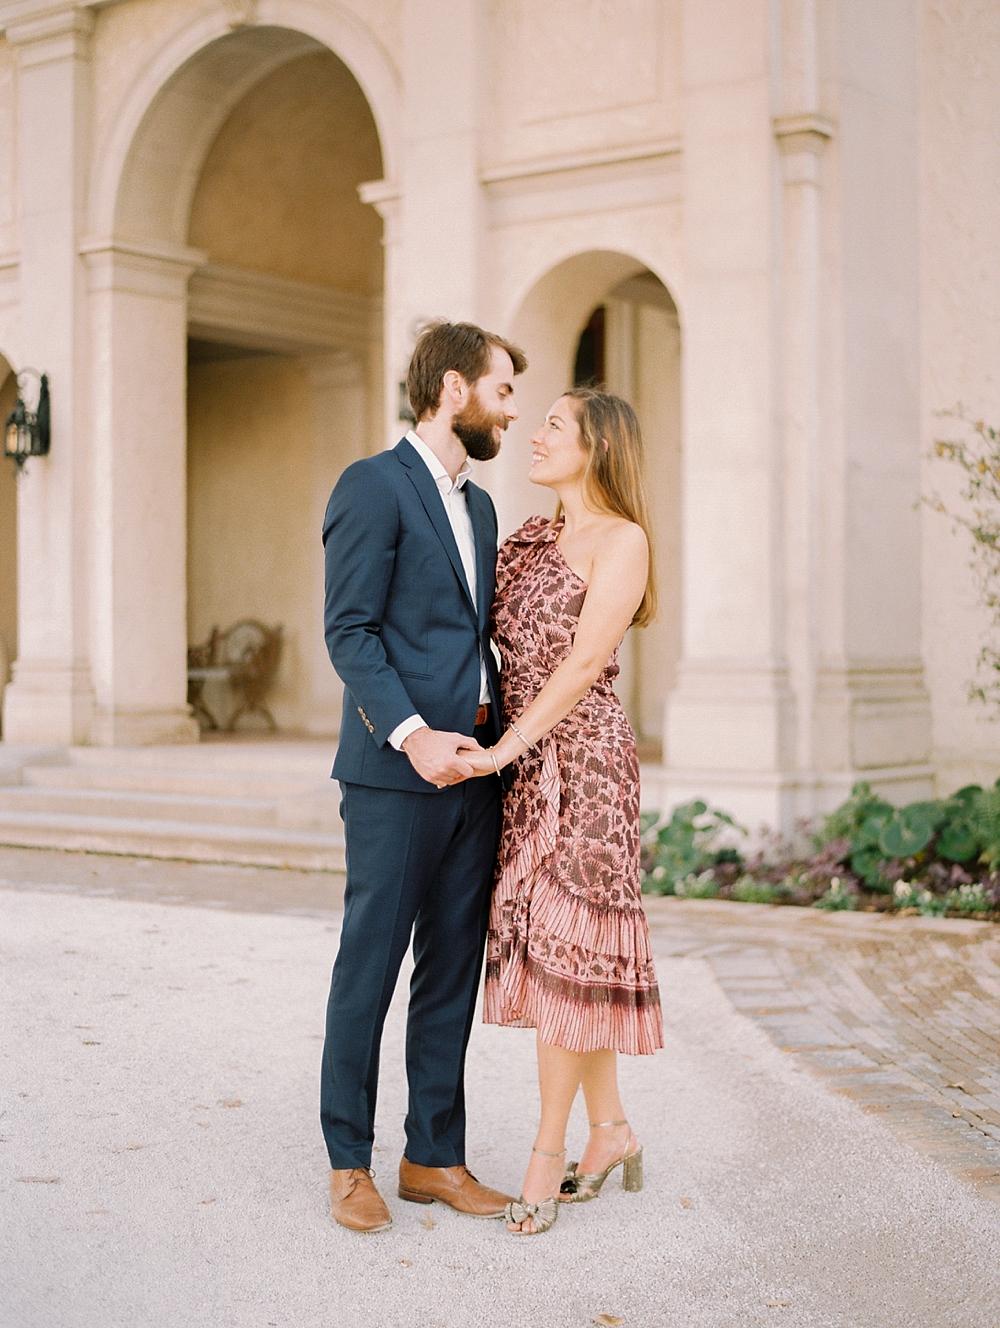 kristin-la-voie-photography-Austin-Wedding-Photographer-laguna-gloria-commodore-perry-estate-engagement-29